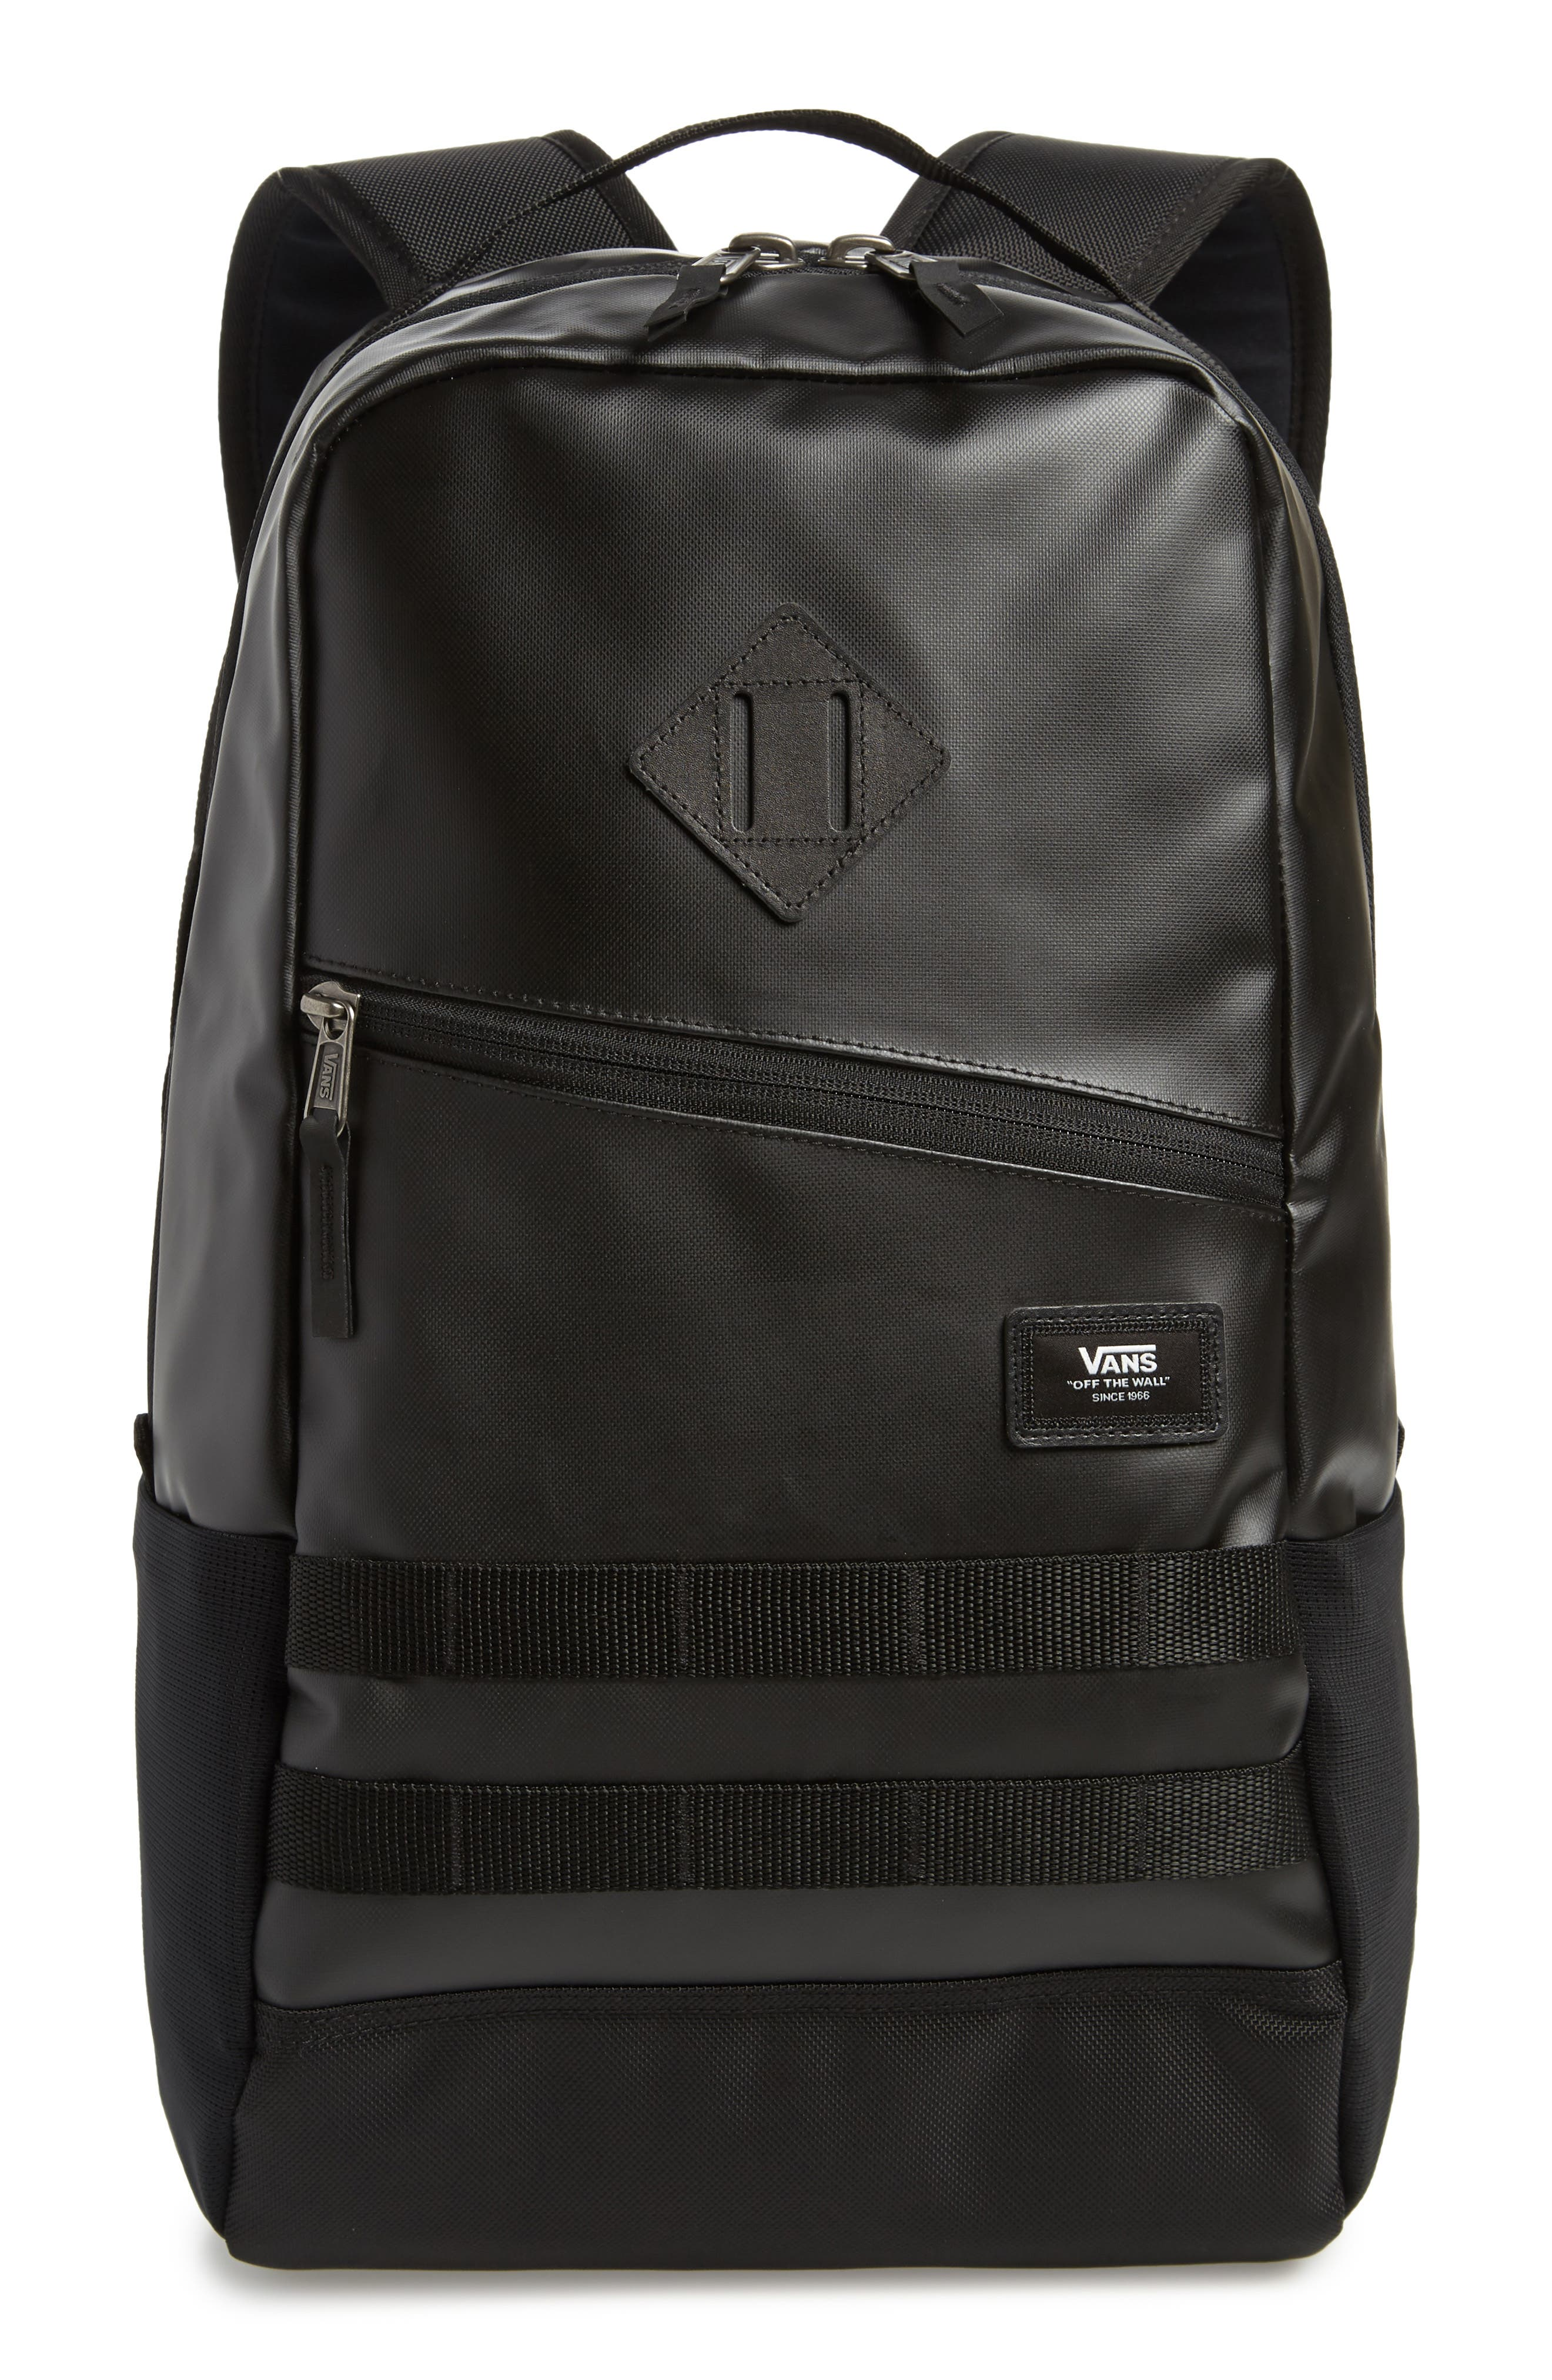 Vans Divulge Water Repellent Backpack - Black